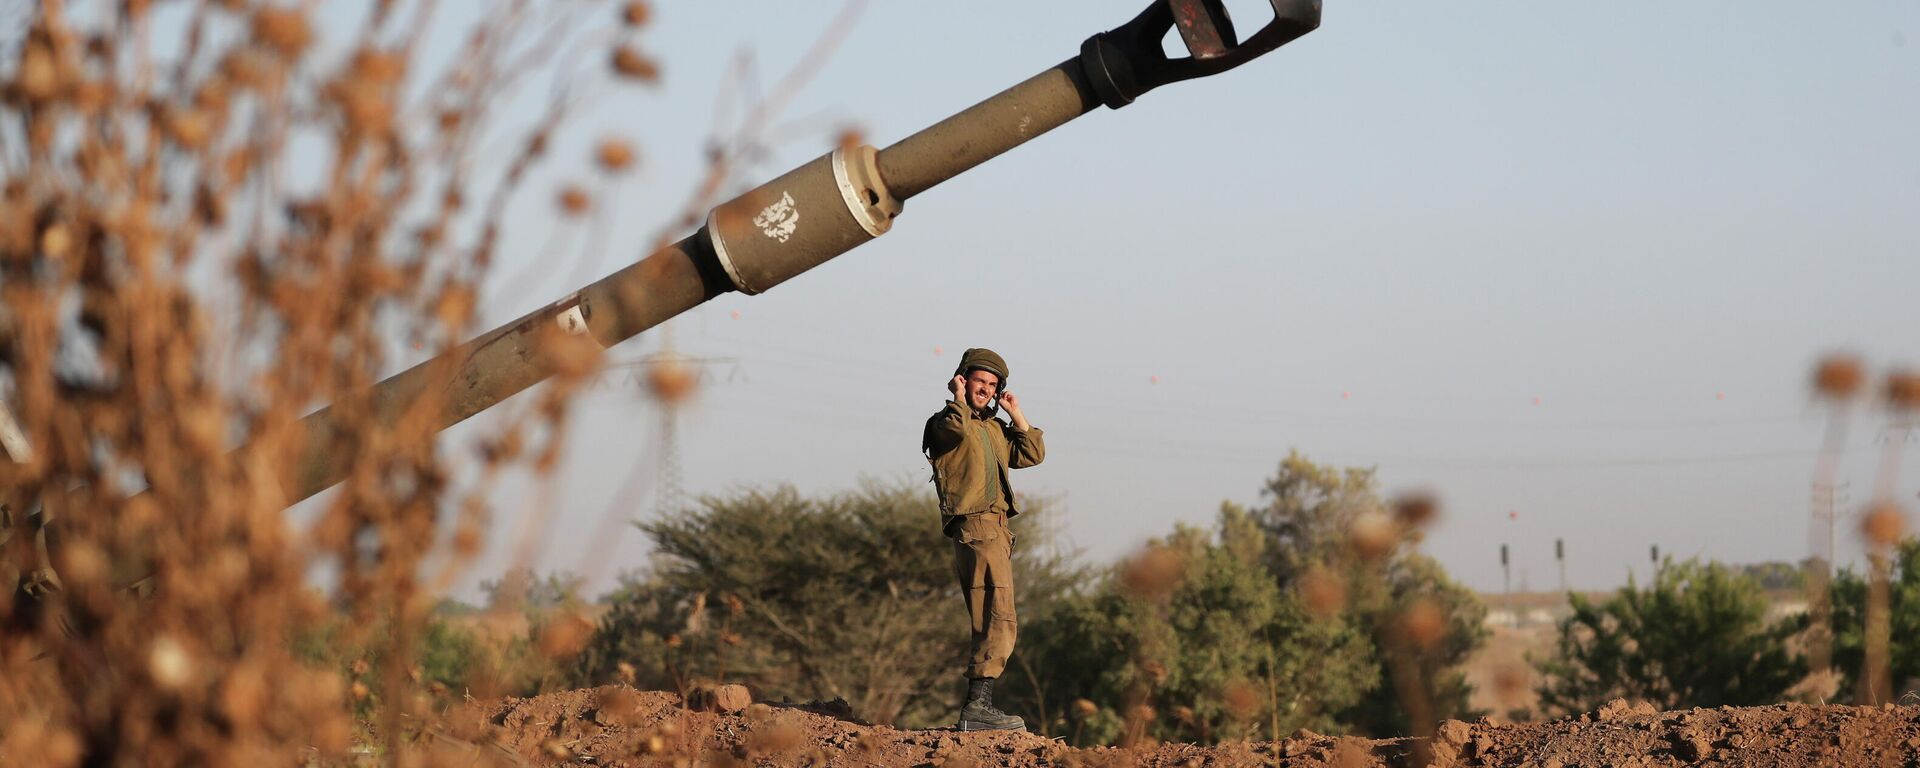 Un soldado israelí - Sputnik Mundo, 1920, 19.05.2021